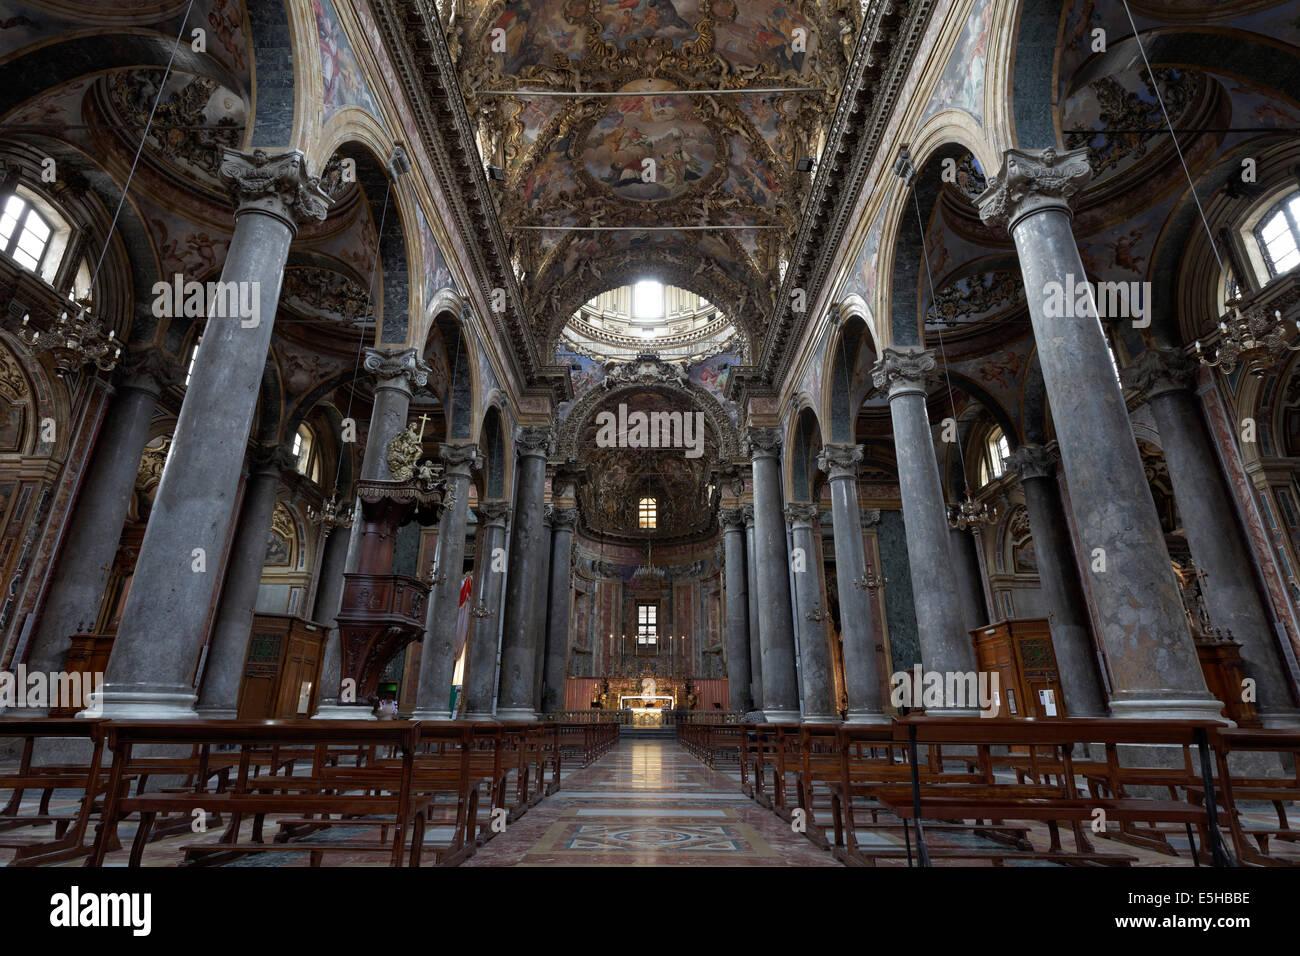 Baroque church of San Giuseppe dei Teatini, Palermo, Province of Palermo, Sicily, Italy - Stock Image